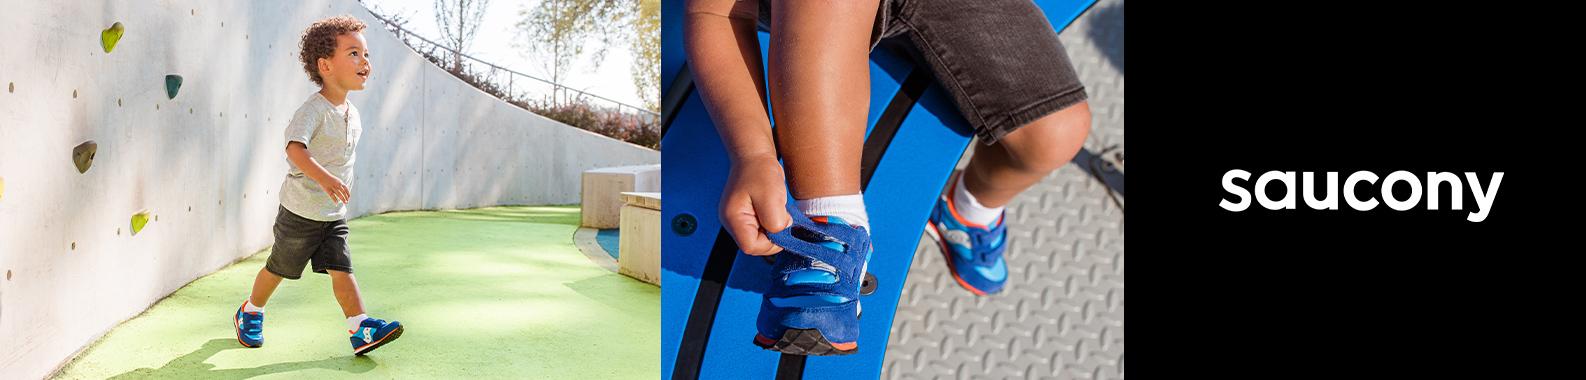 Saucony brand header image